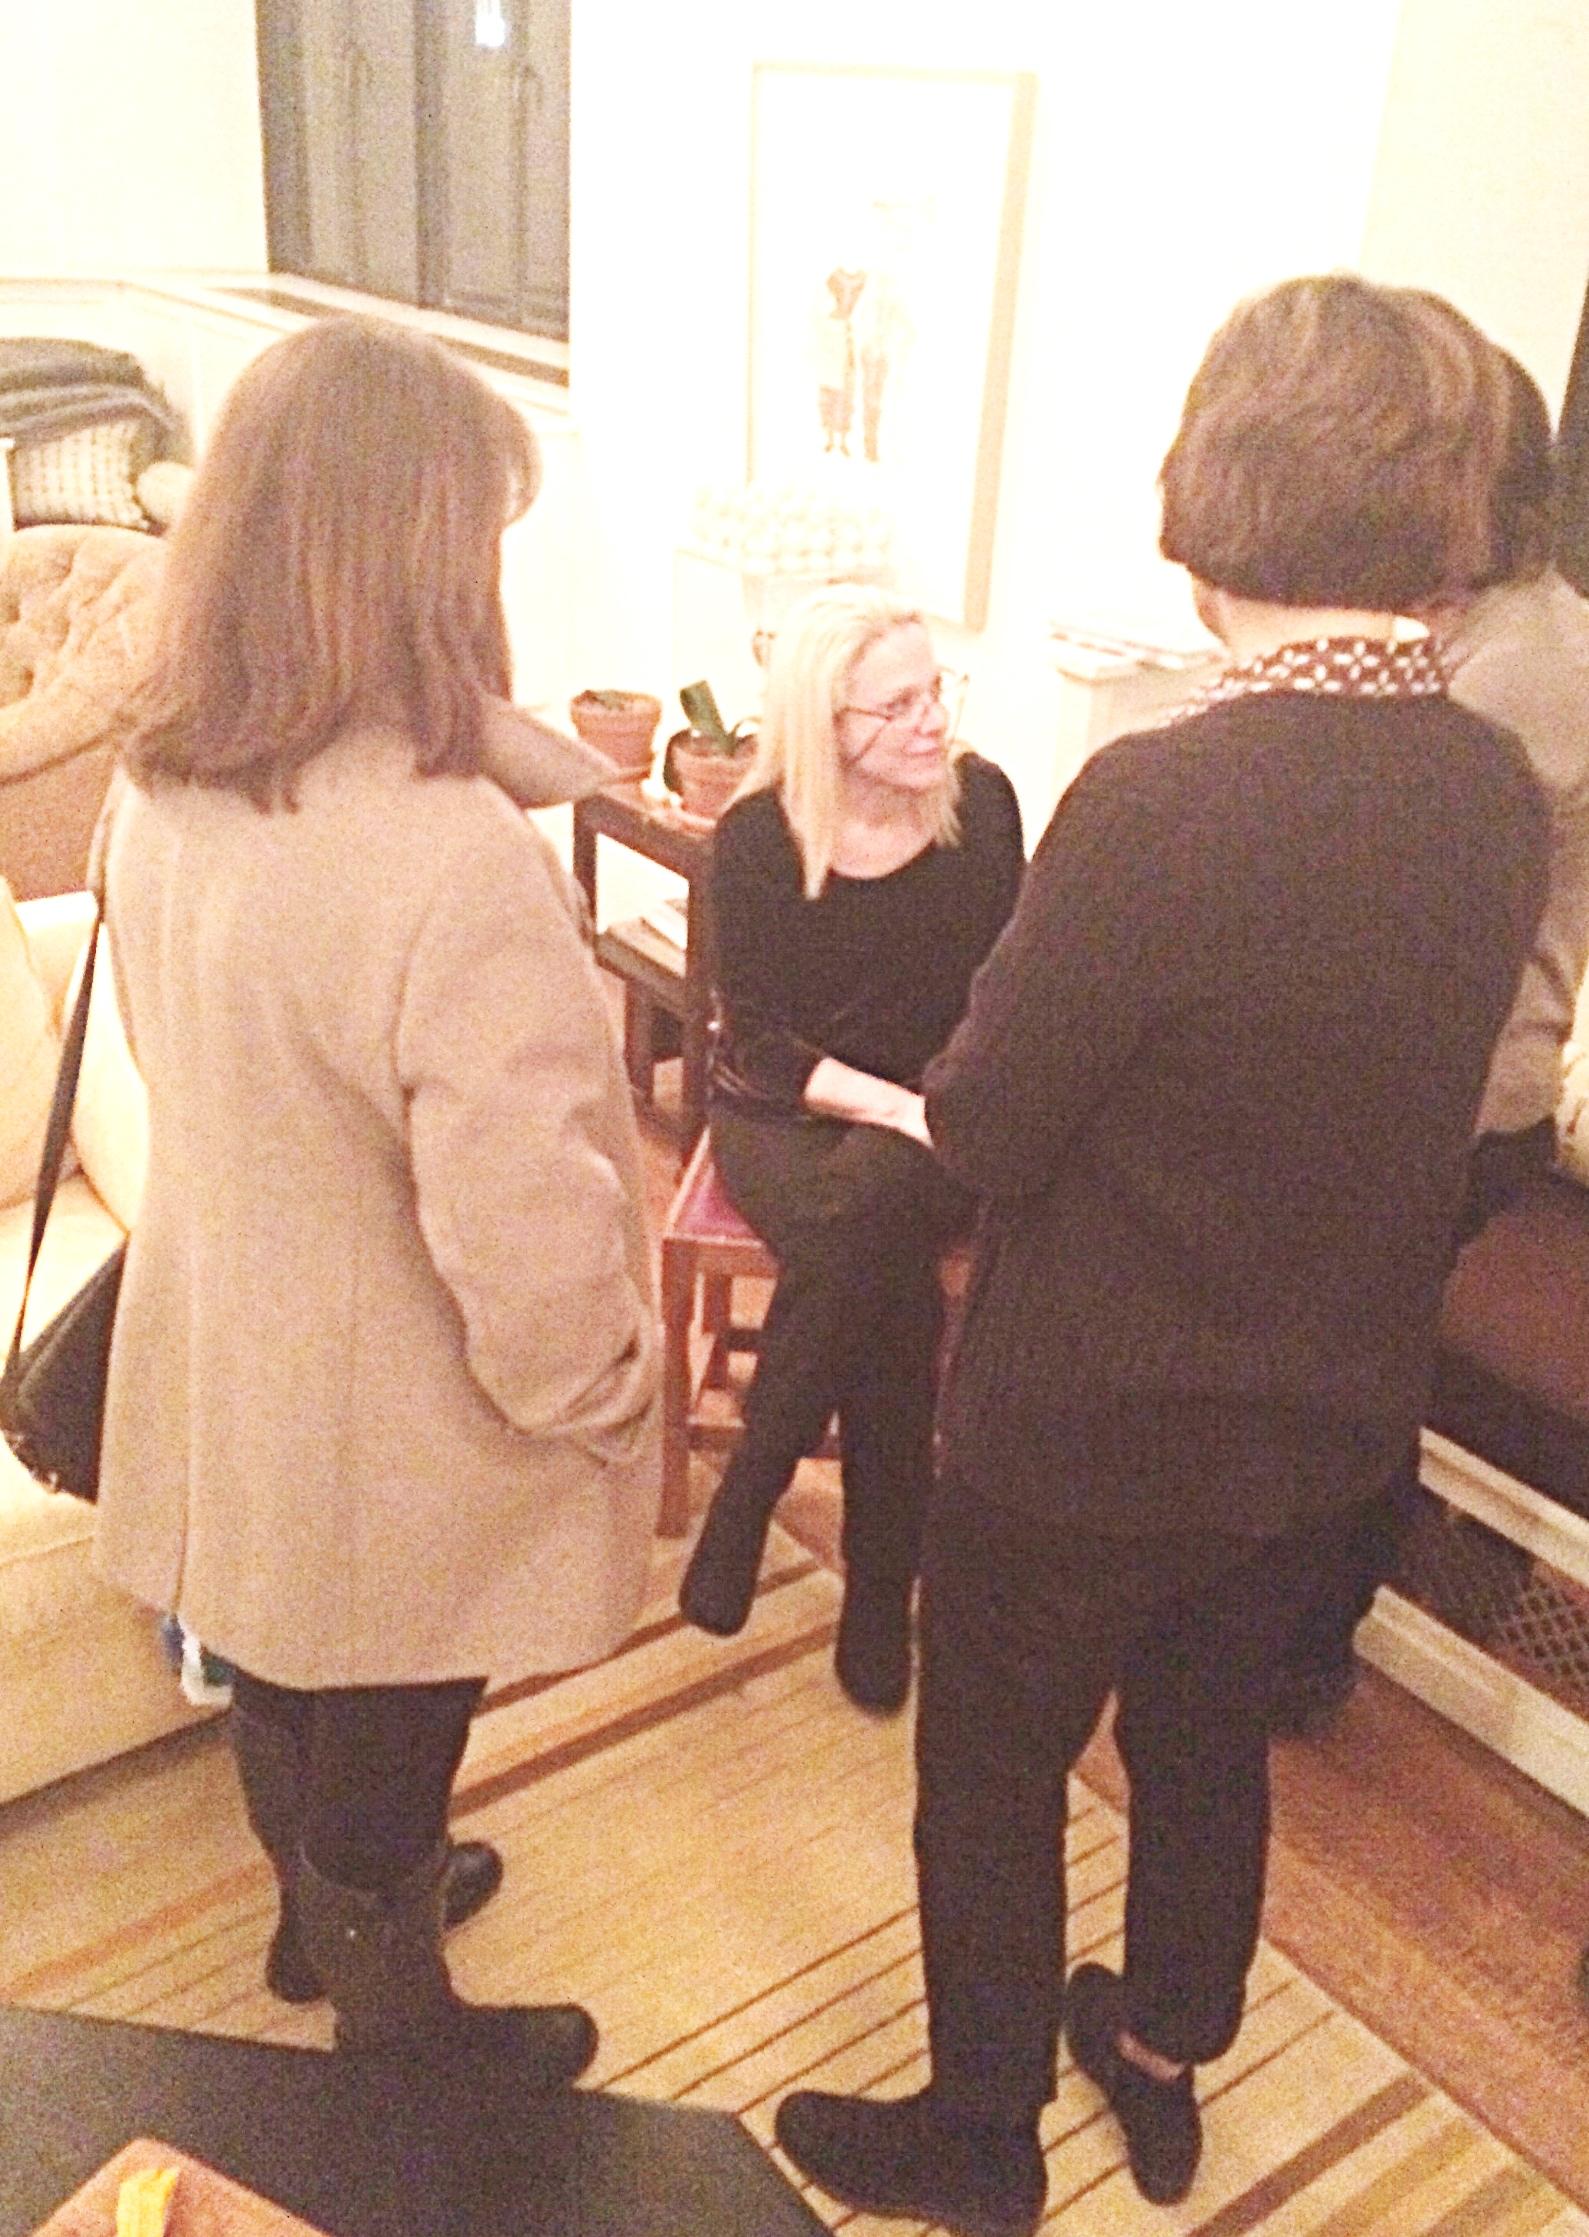 Alex Witchel discusses her memoir ALL GONE